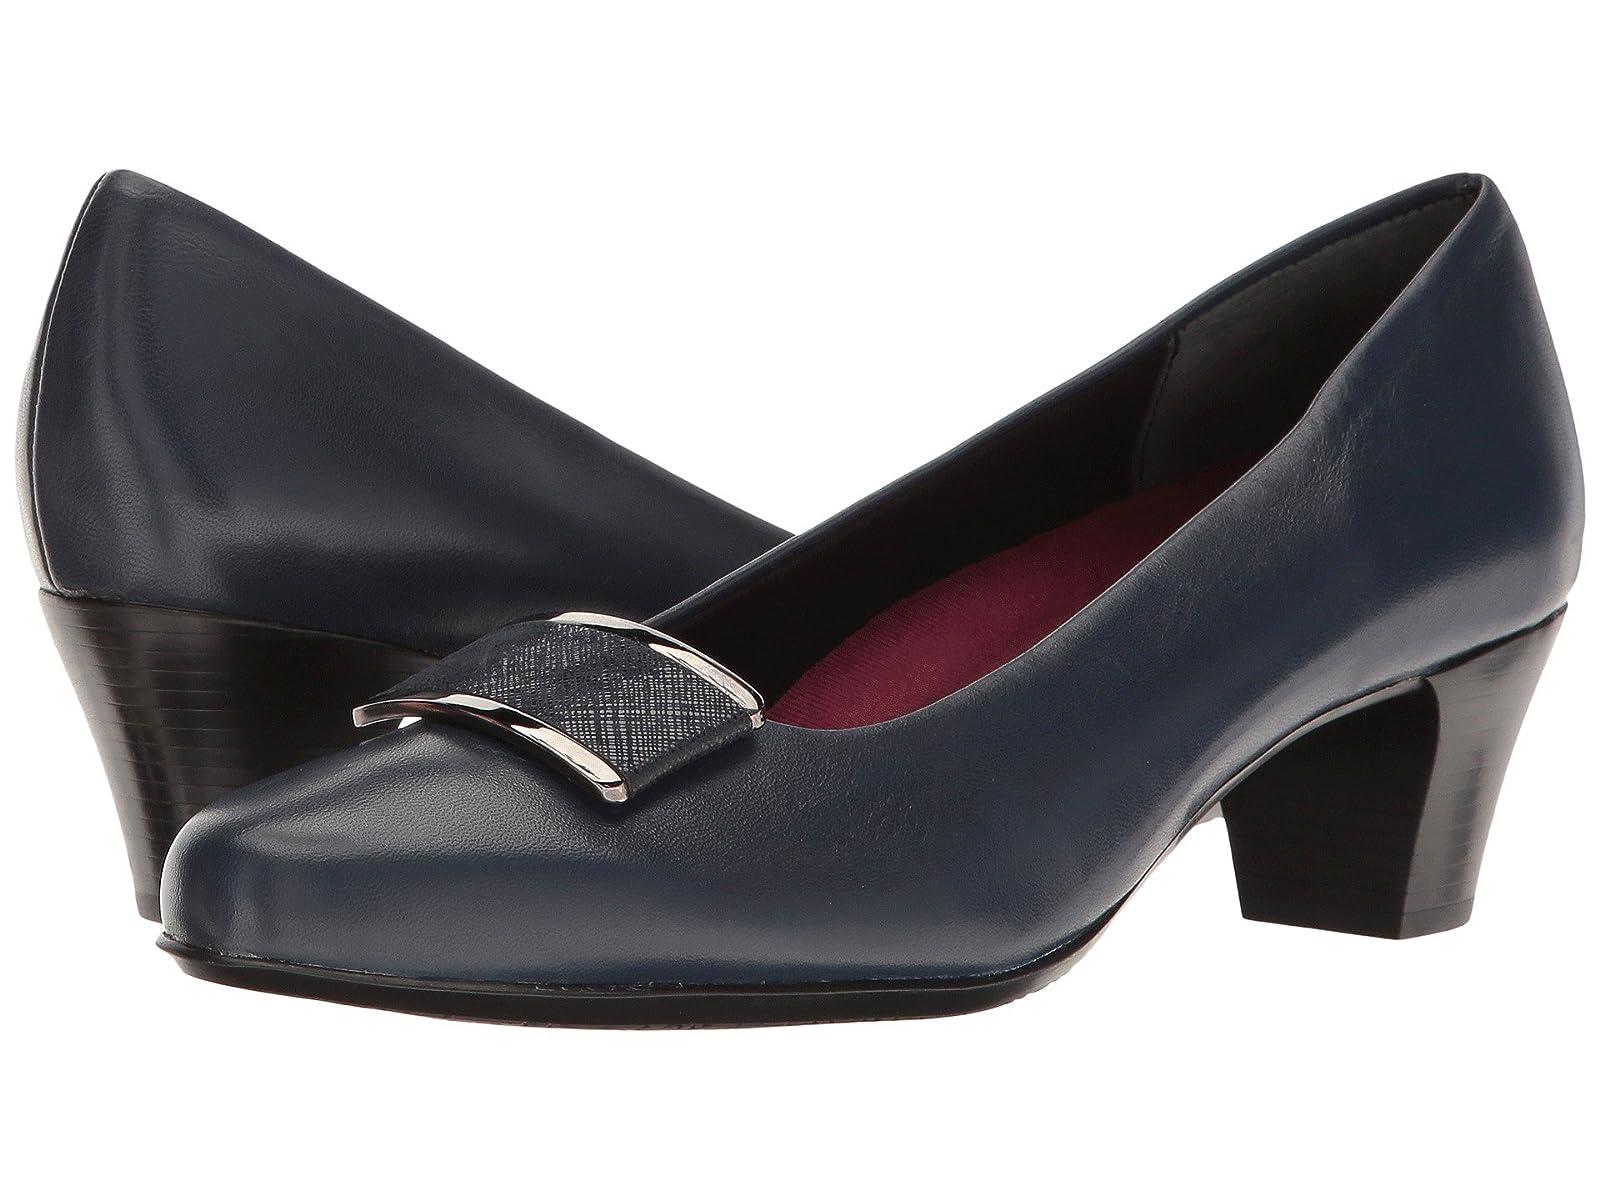 Munro MaraCheap and distinctive eye-catching shoes